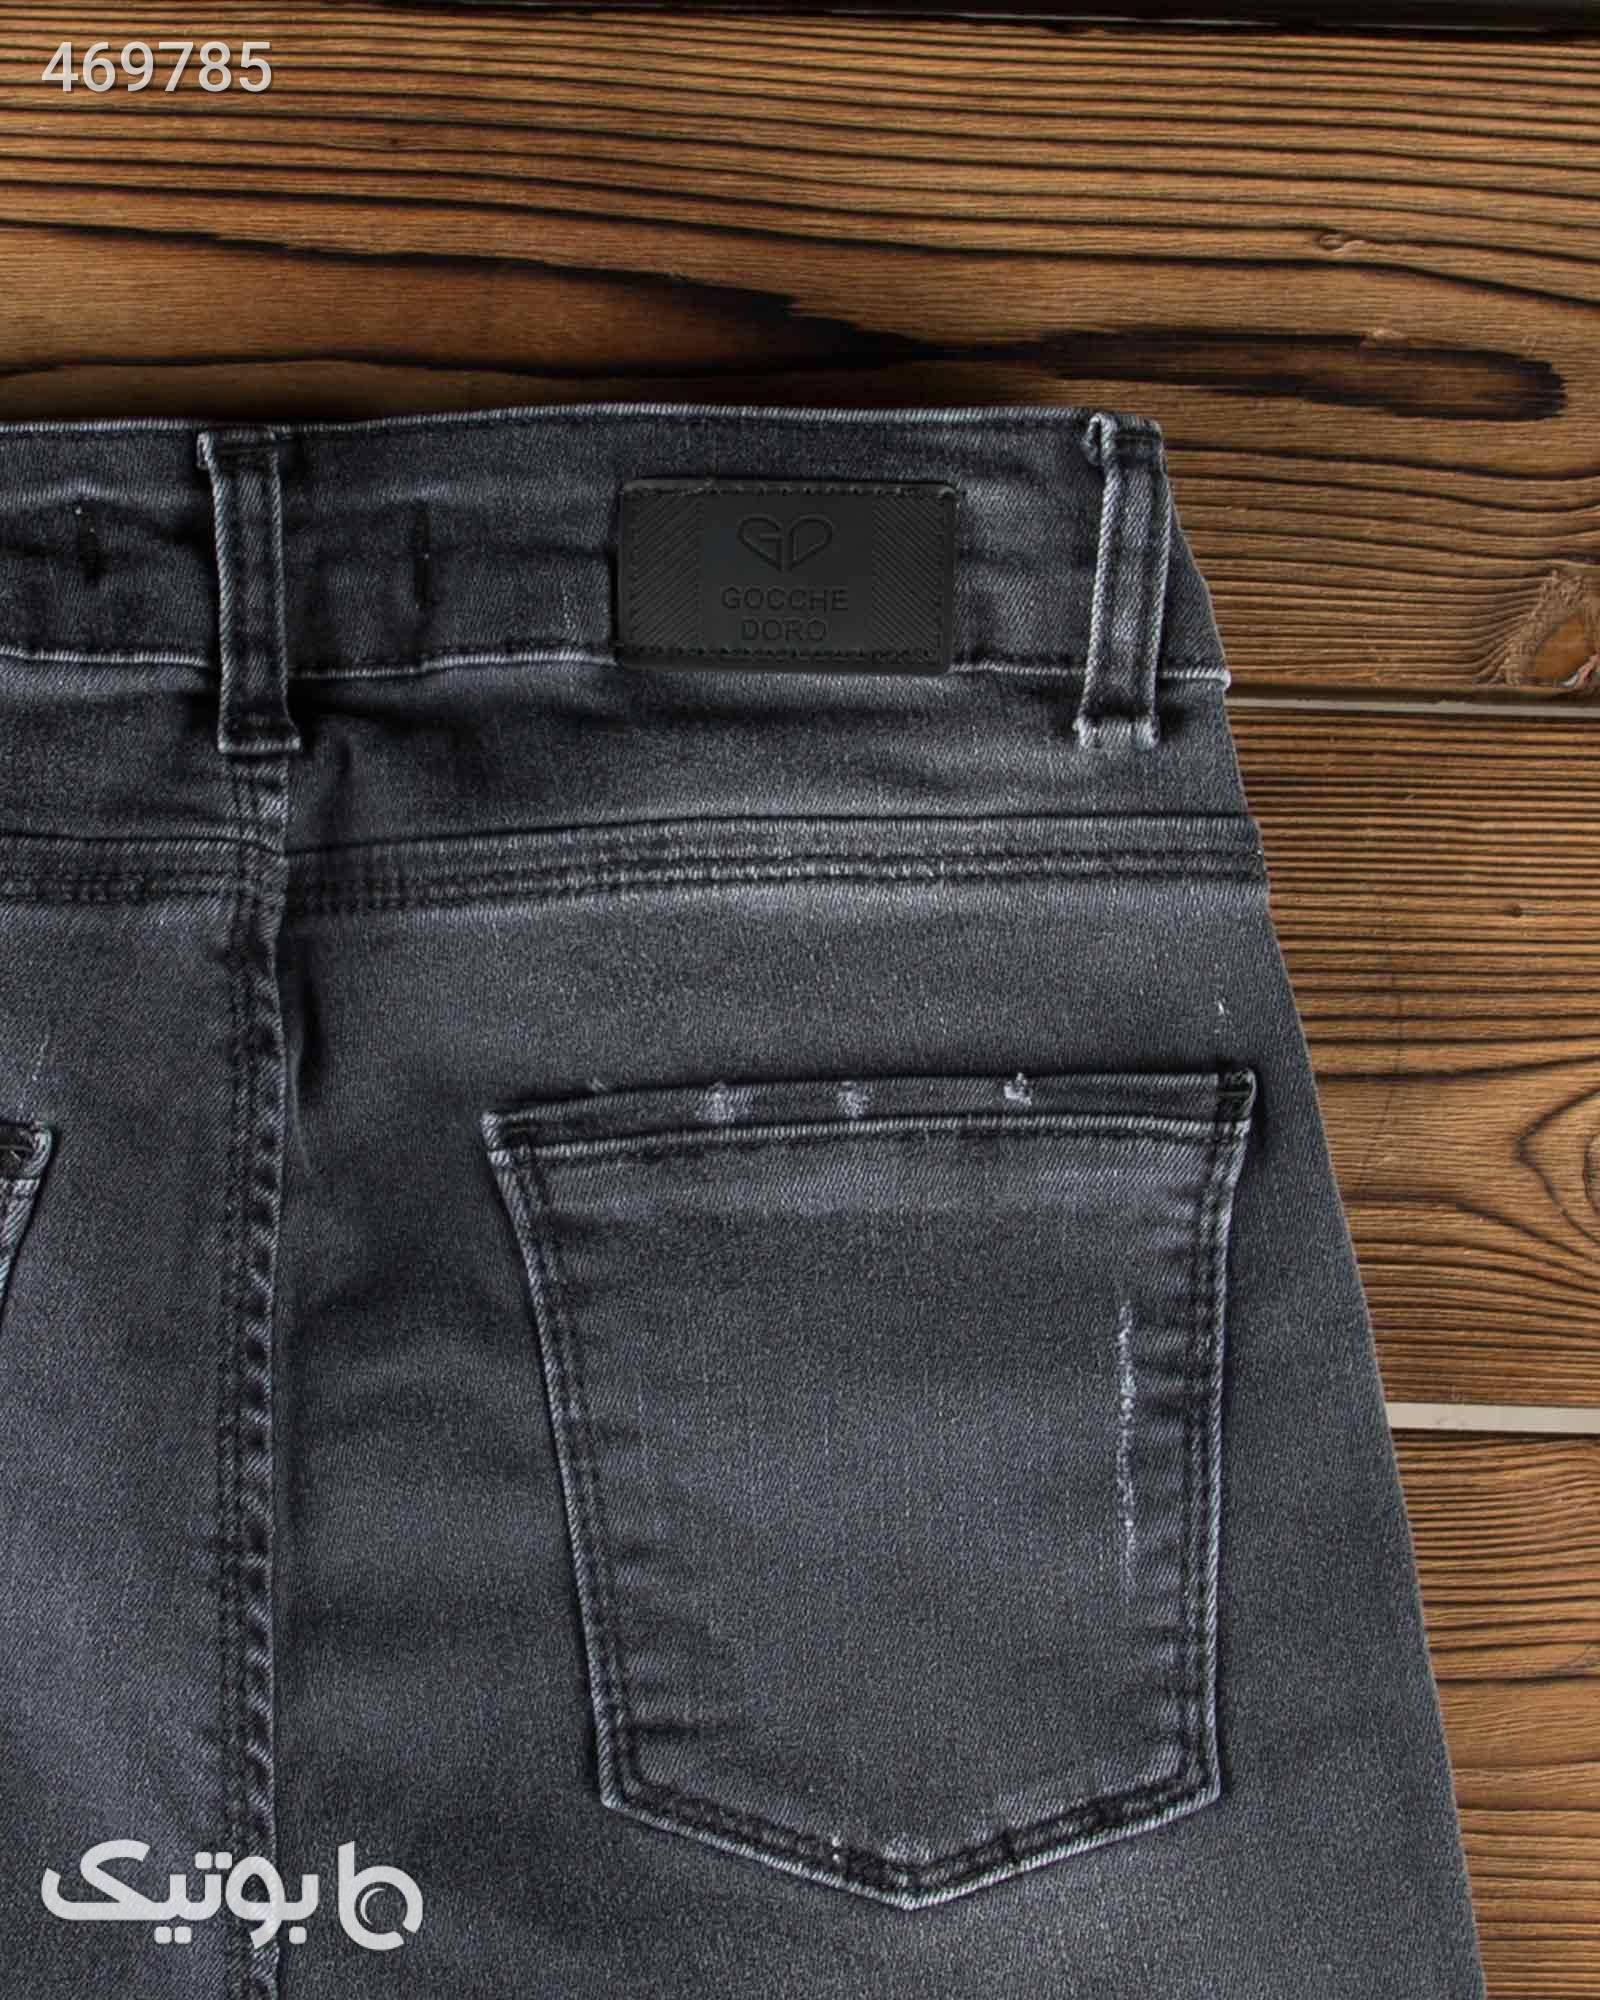 شلوار جین جذب ذغالی زنانه - ذغالی طوسی شلوار زنانه